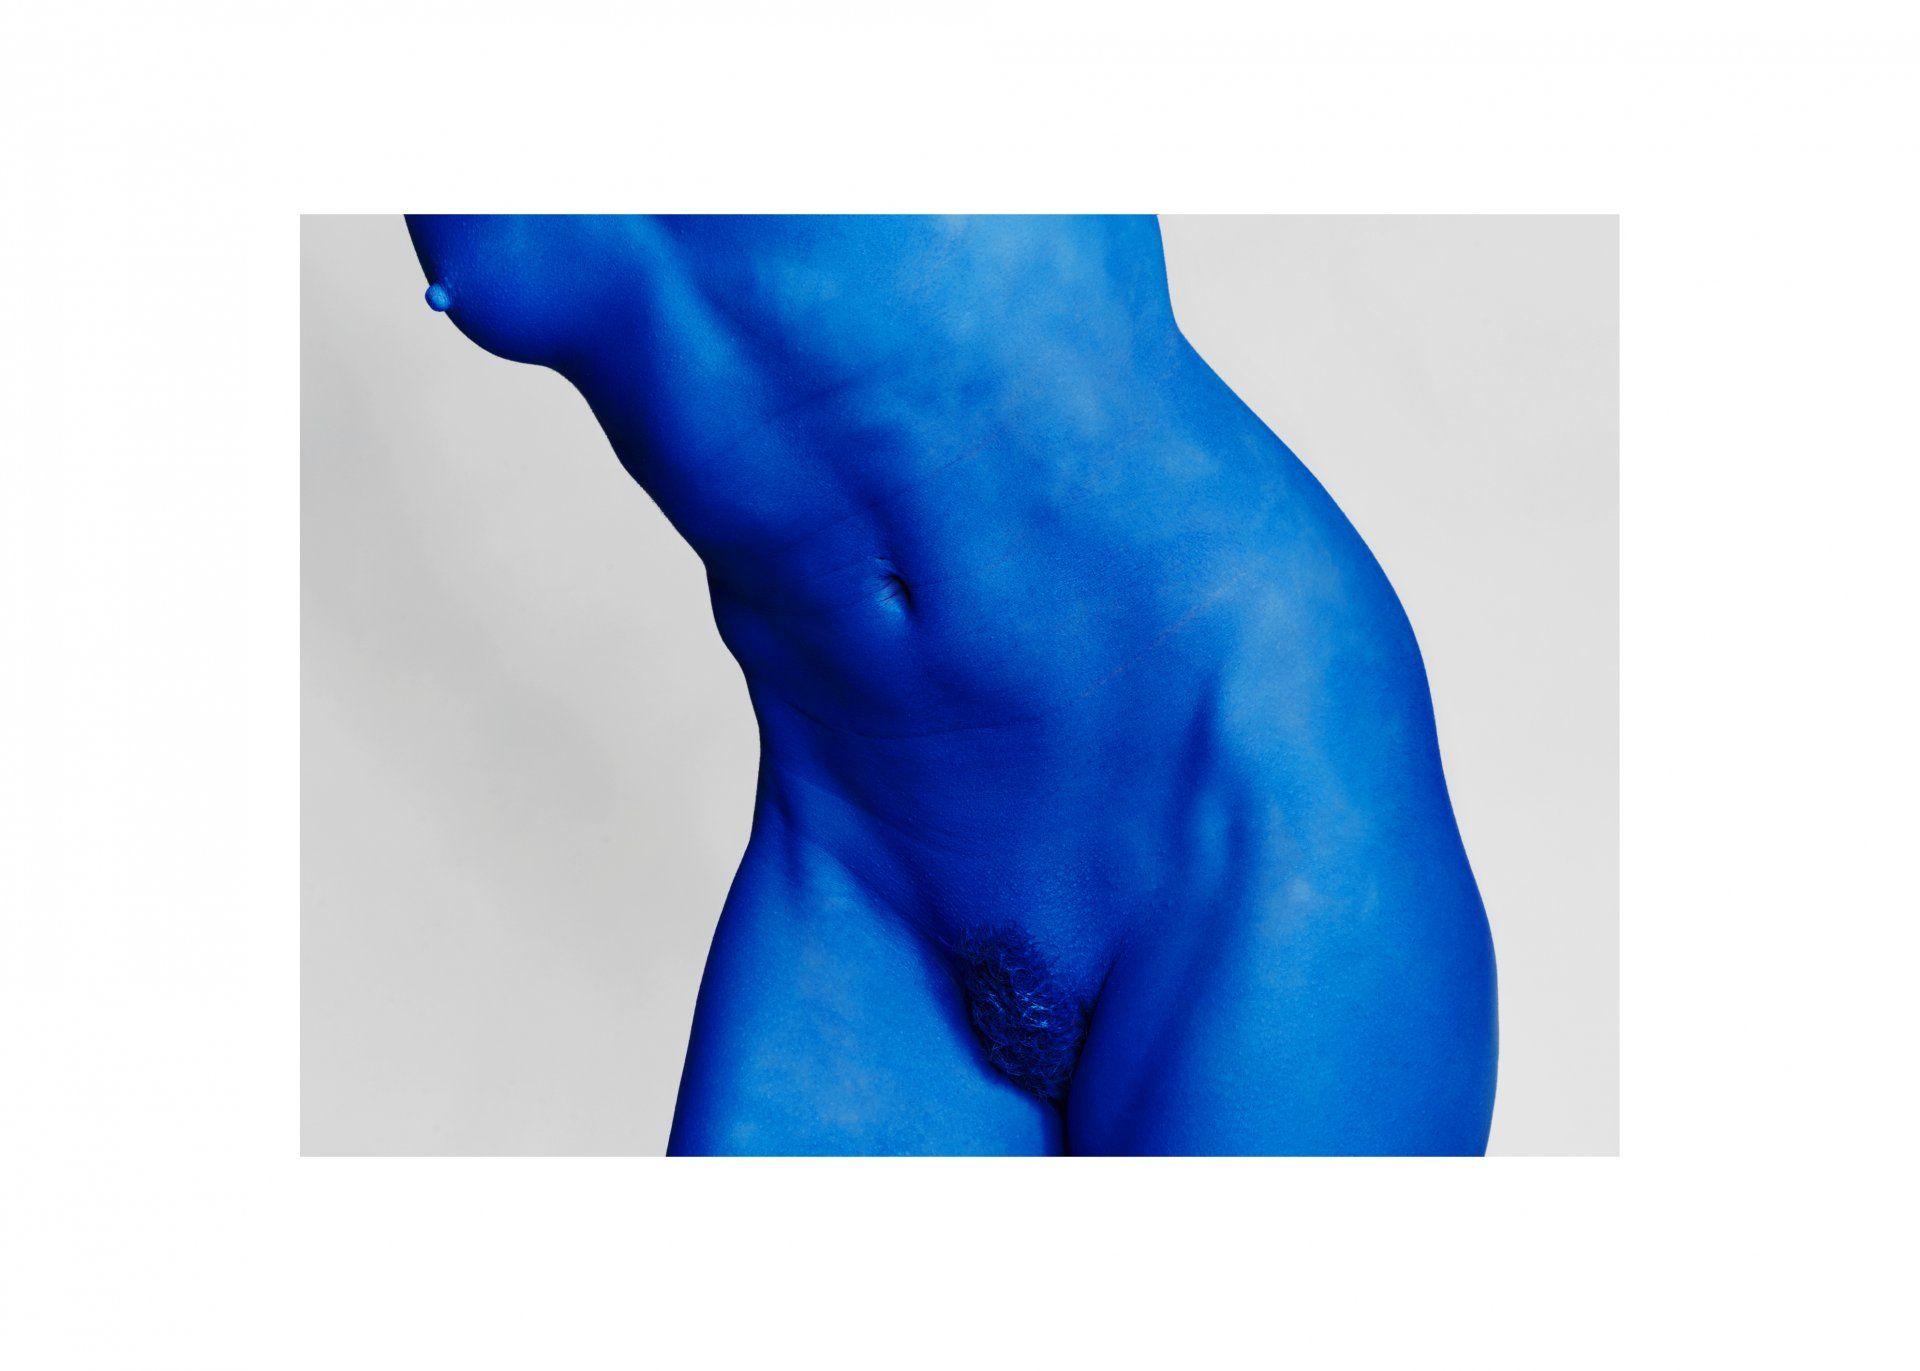 Blue Abramow CHARLOTTE - PHOTOGRAPHY